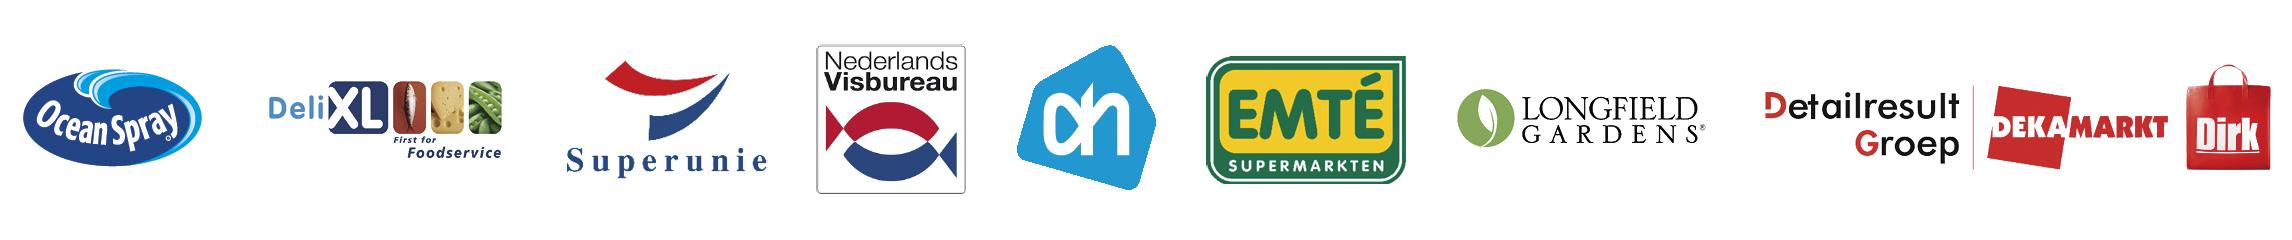 logo's Combining crafts referenties8.2